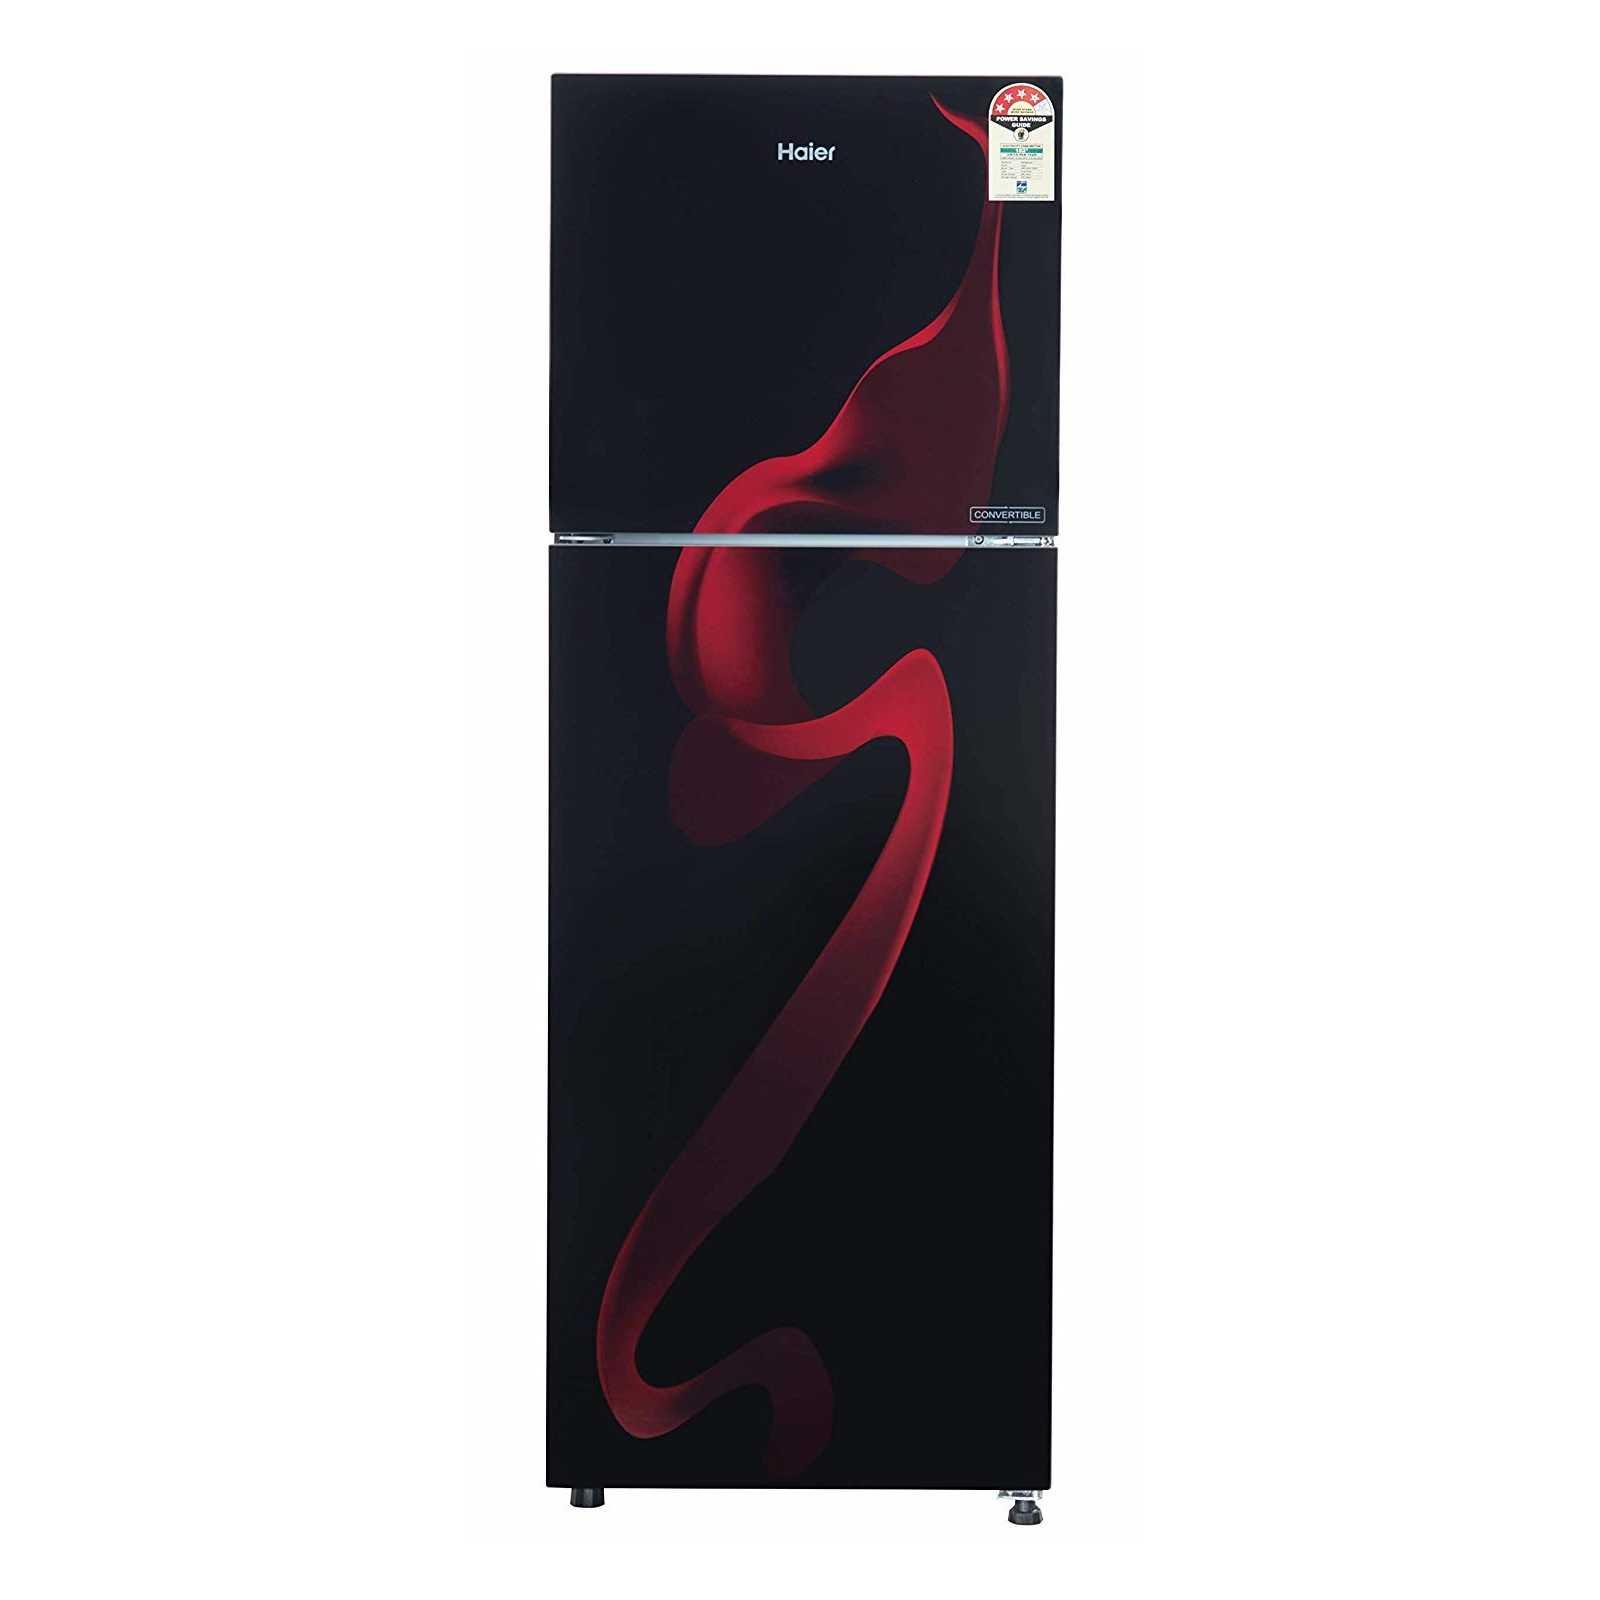 Haier HRF 2784PSG E 258 Litre Inverter Frost Free Double Door Refrigerator